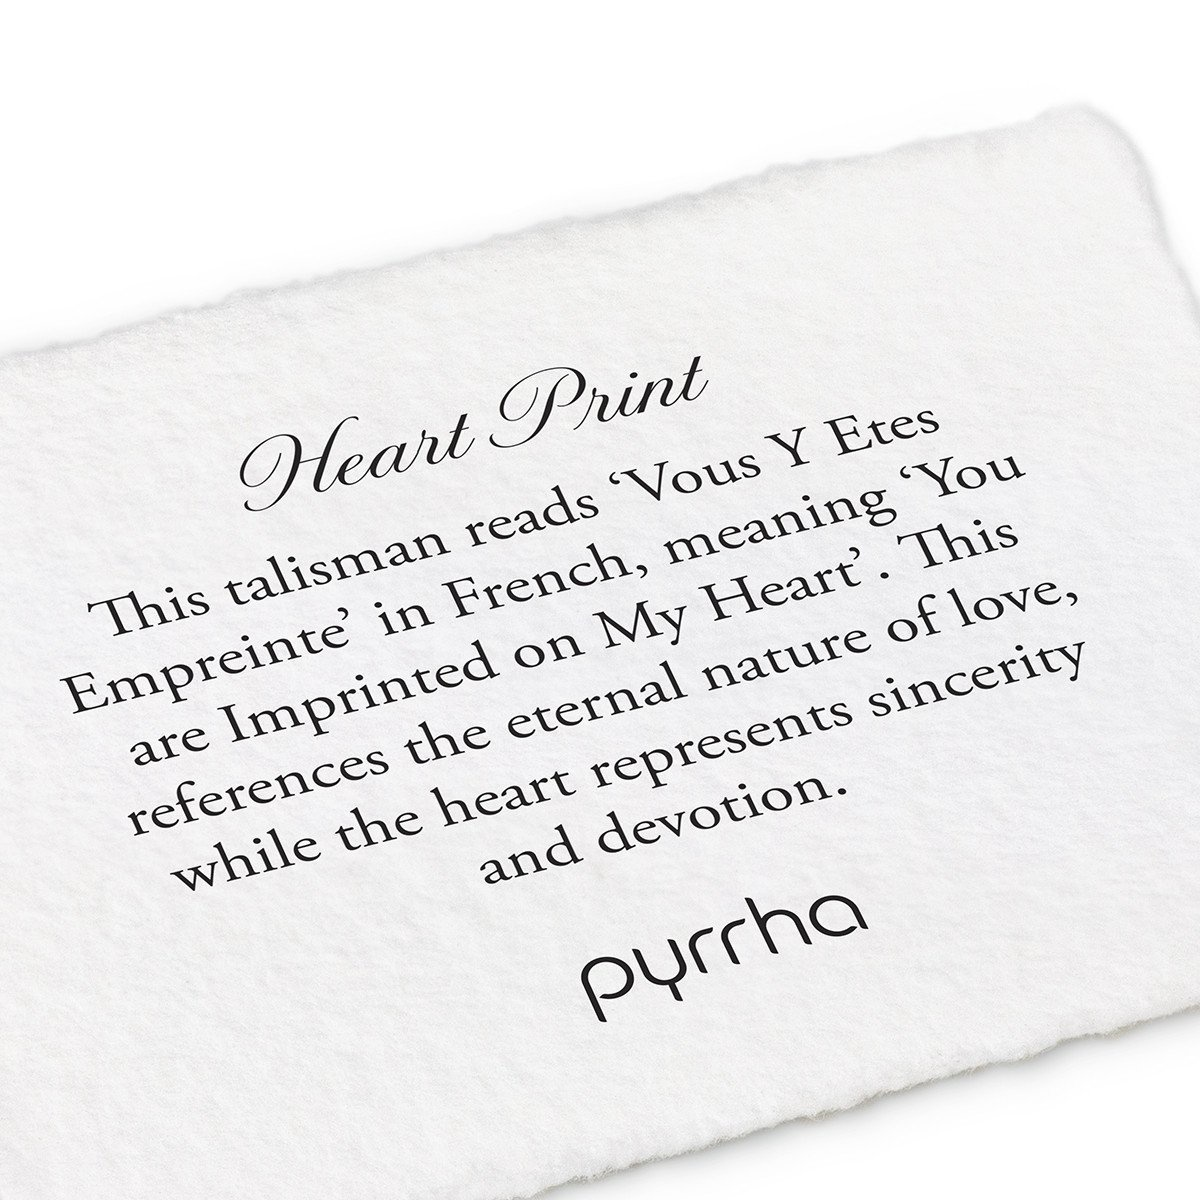 Pyrrha Pyrrha- Heart Print Ring sz 6